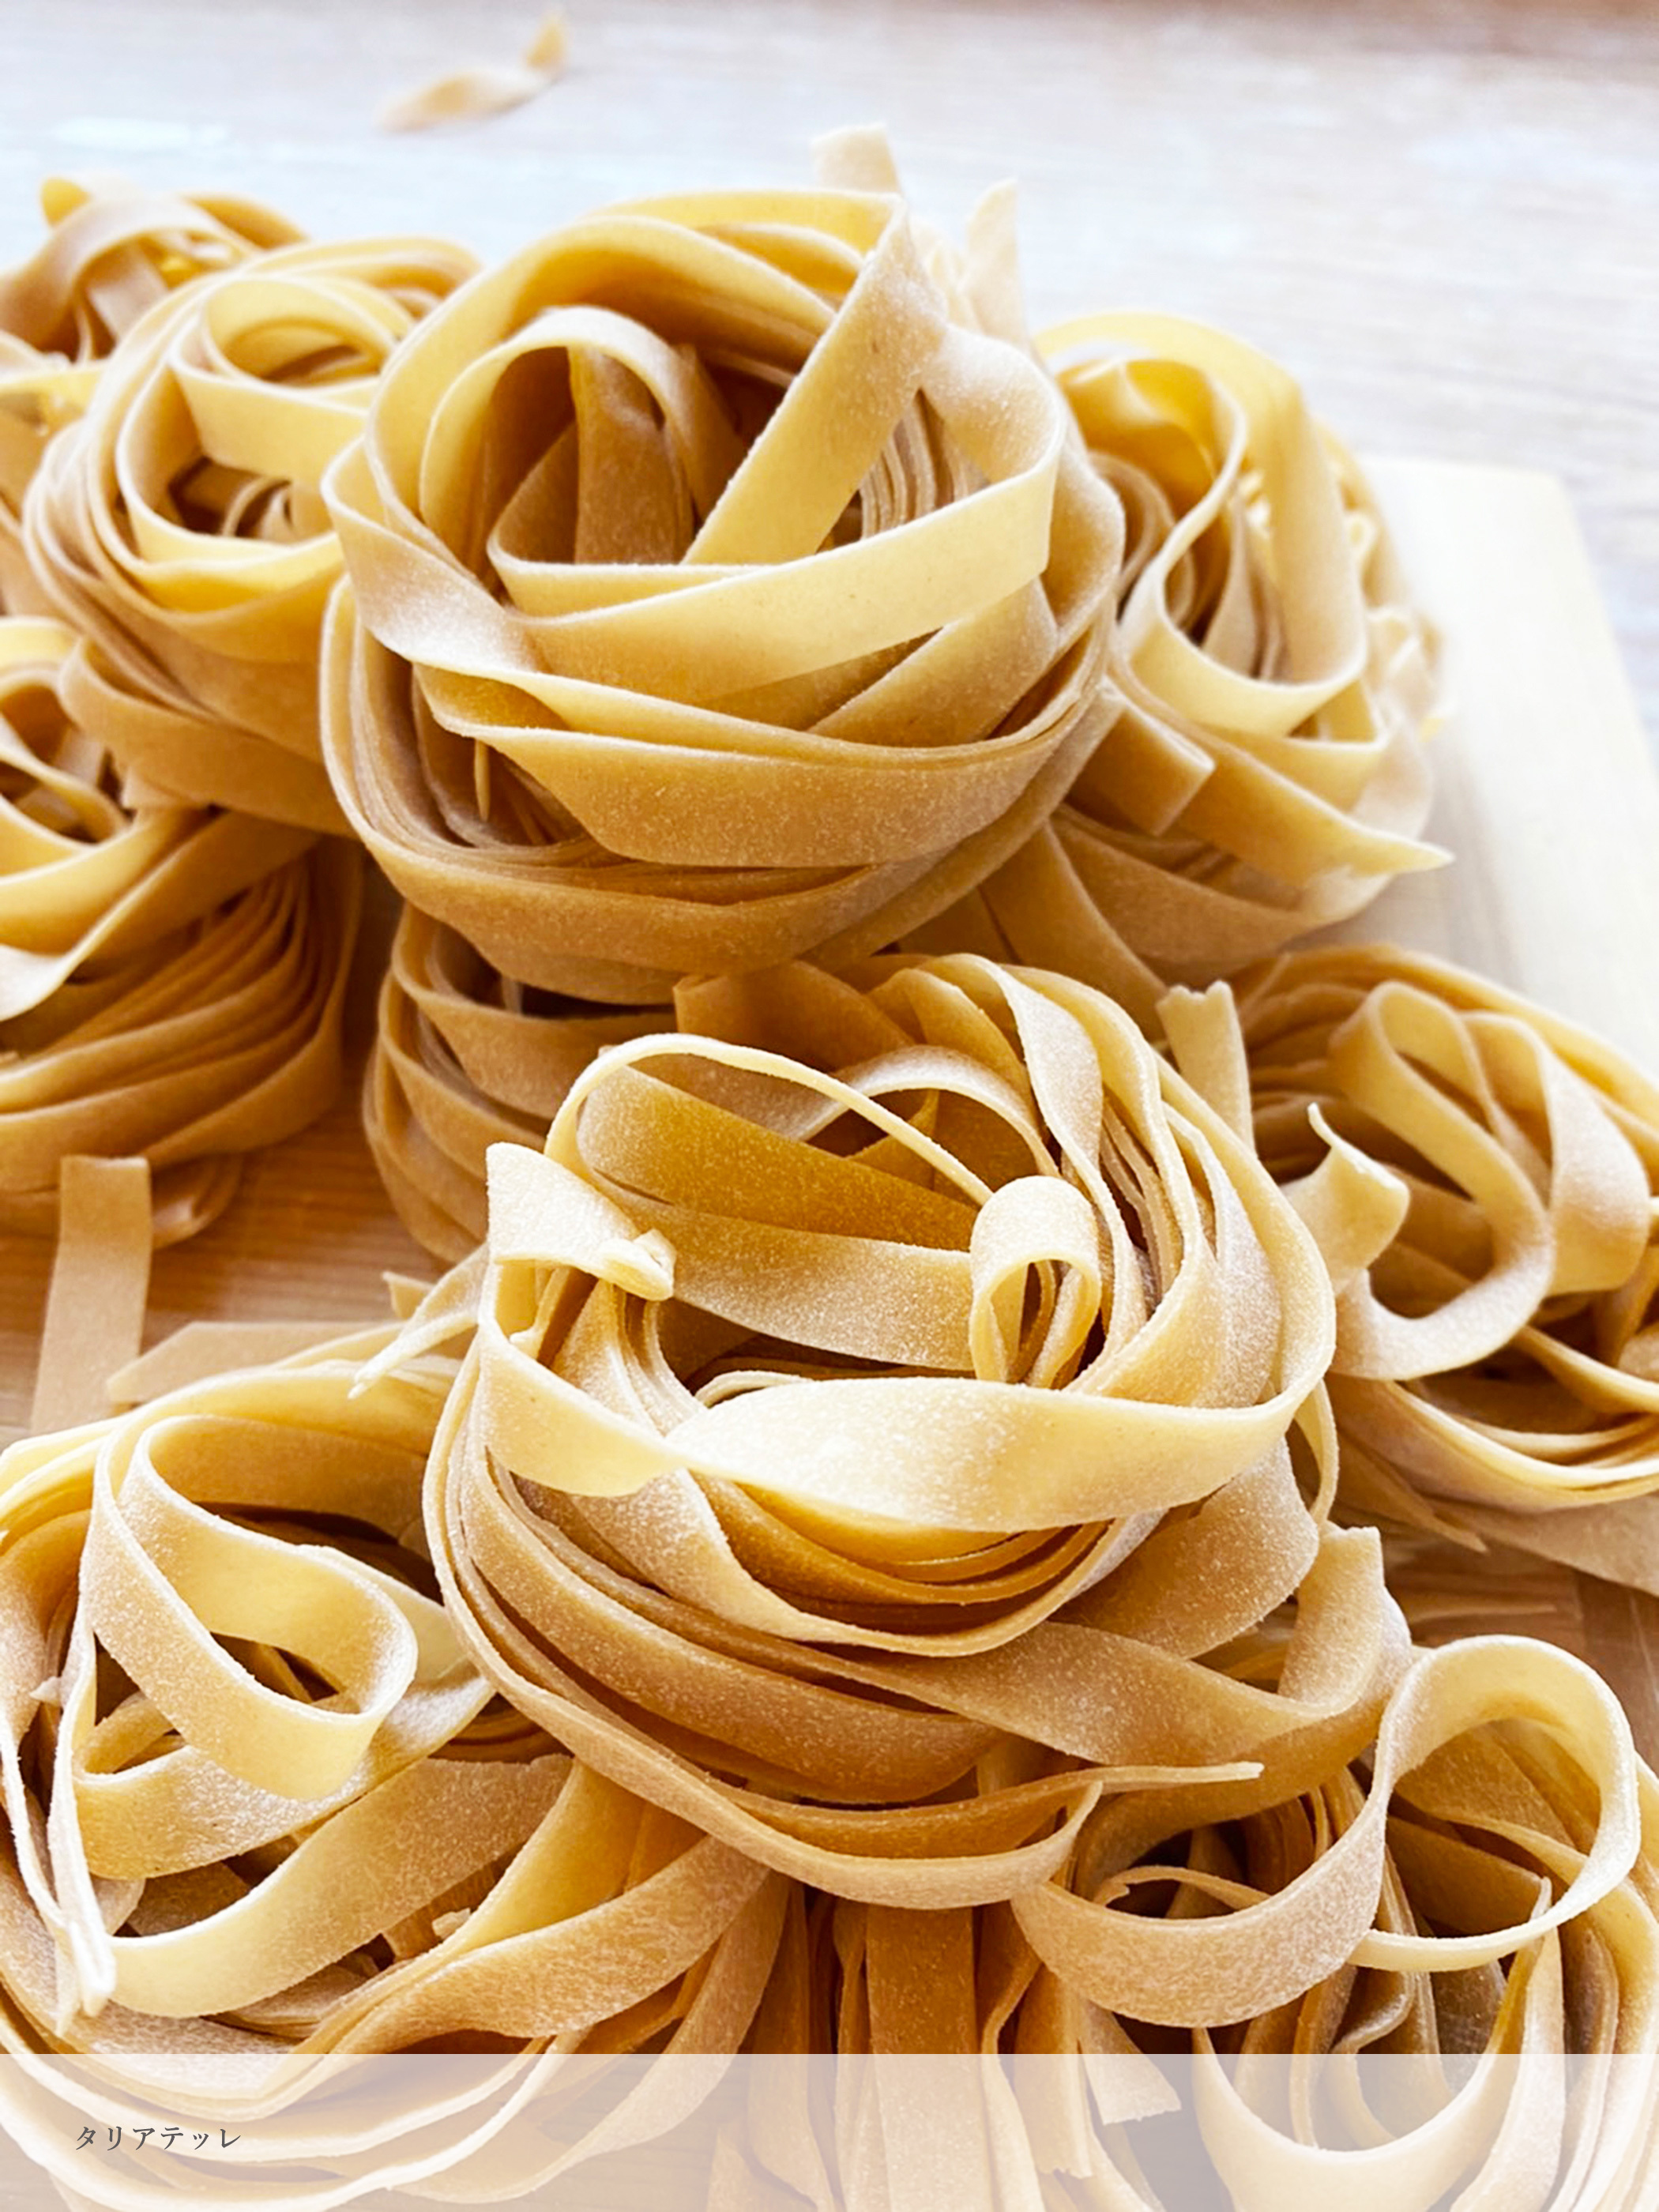 Pastificio SuginoセットC【パスタプレート/割草花 1枚×手のしパスタ 3種(各80g)】